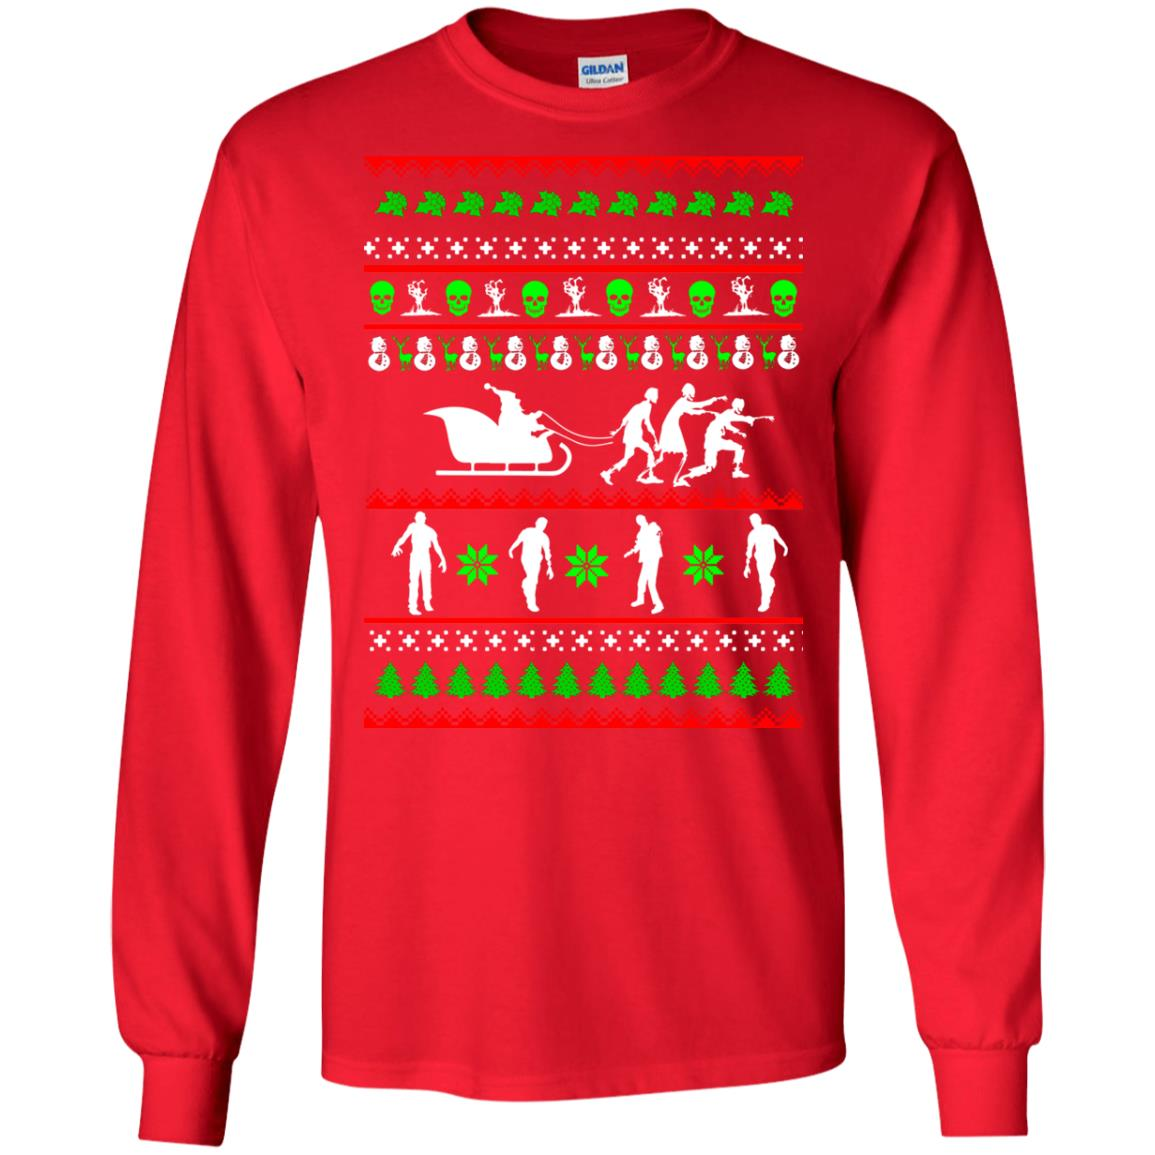 image 5831 - Zombie Christmas Sweater, Hoodie